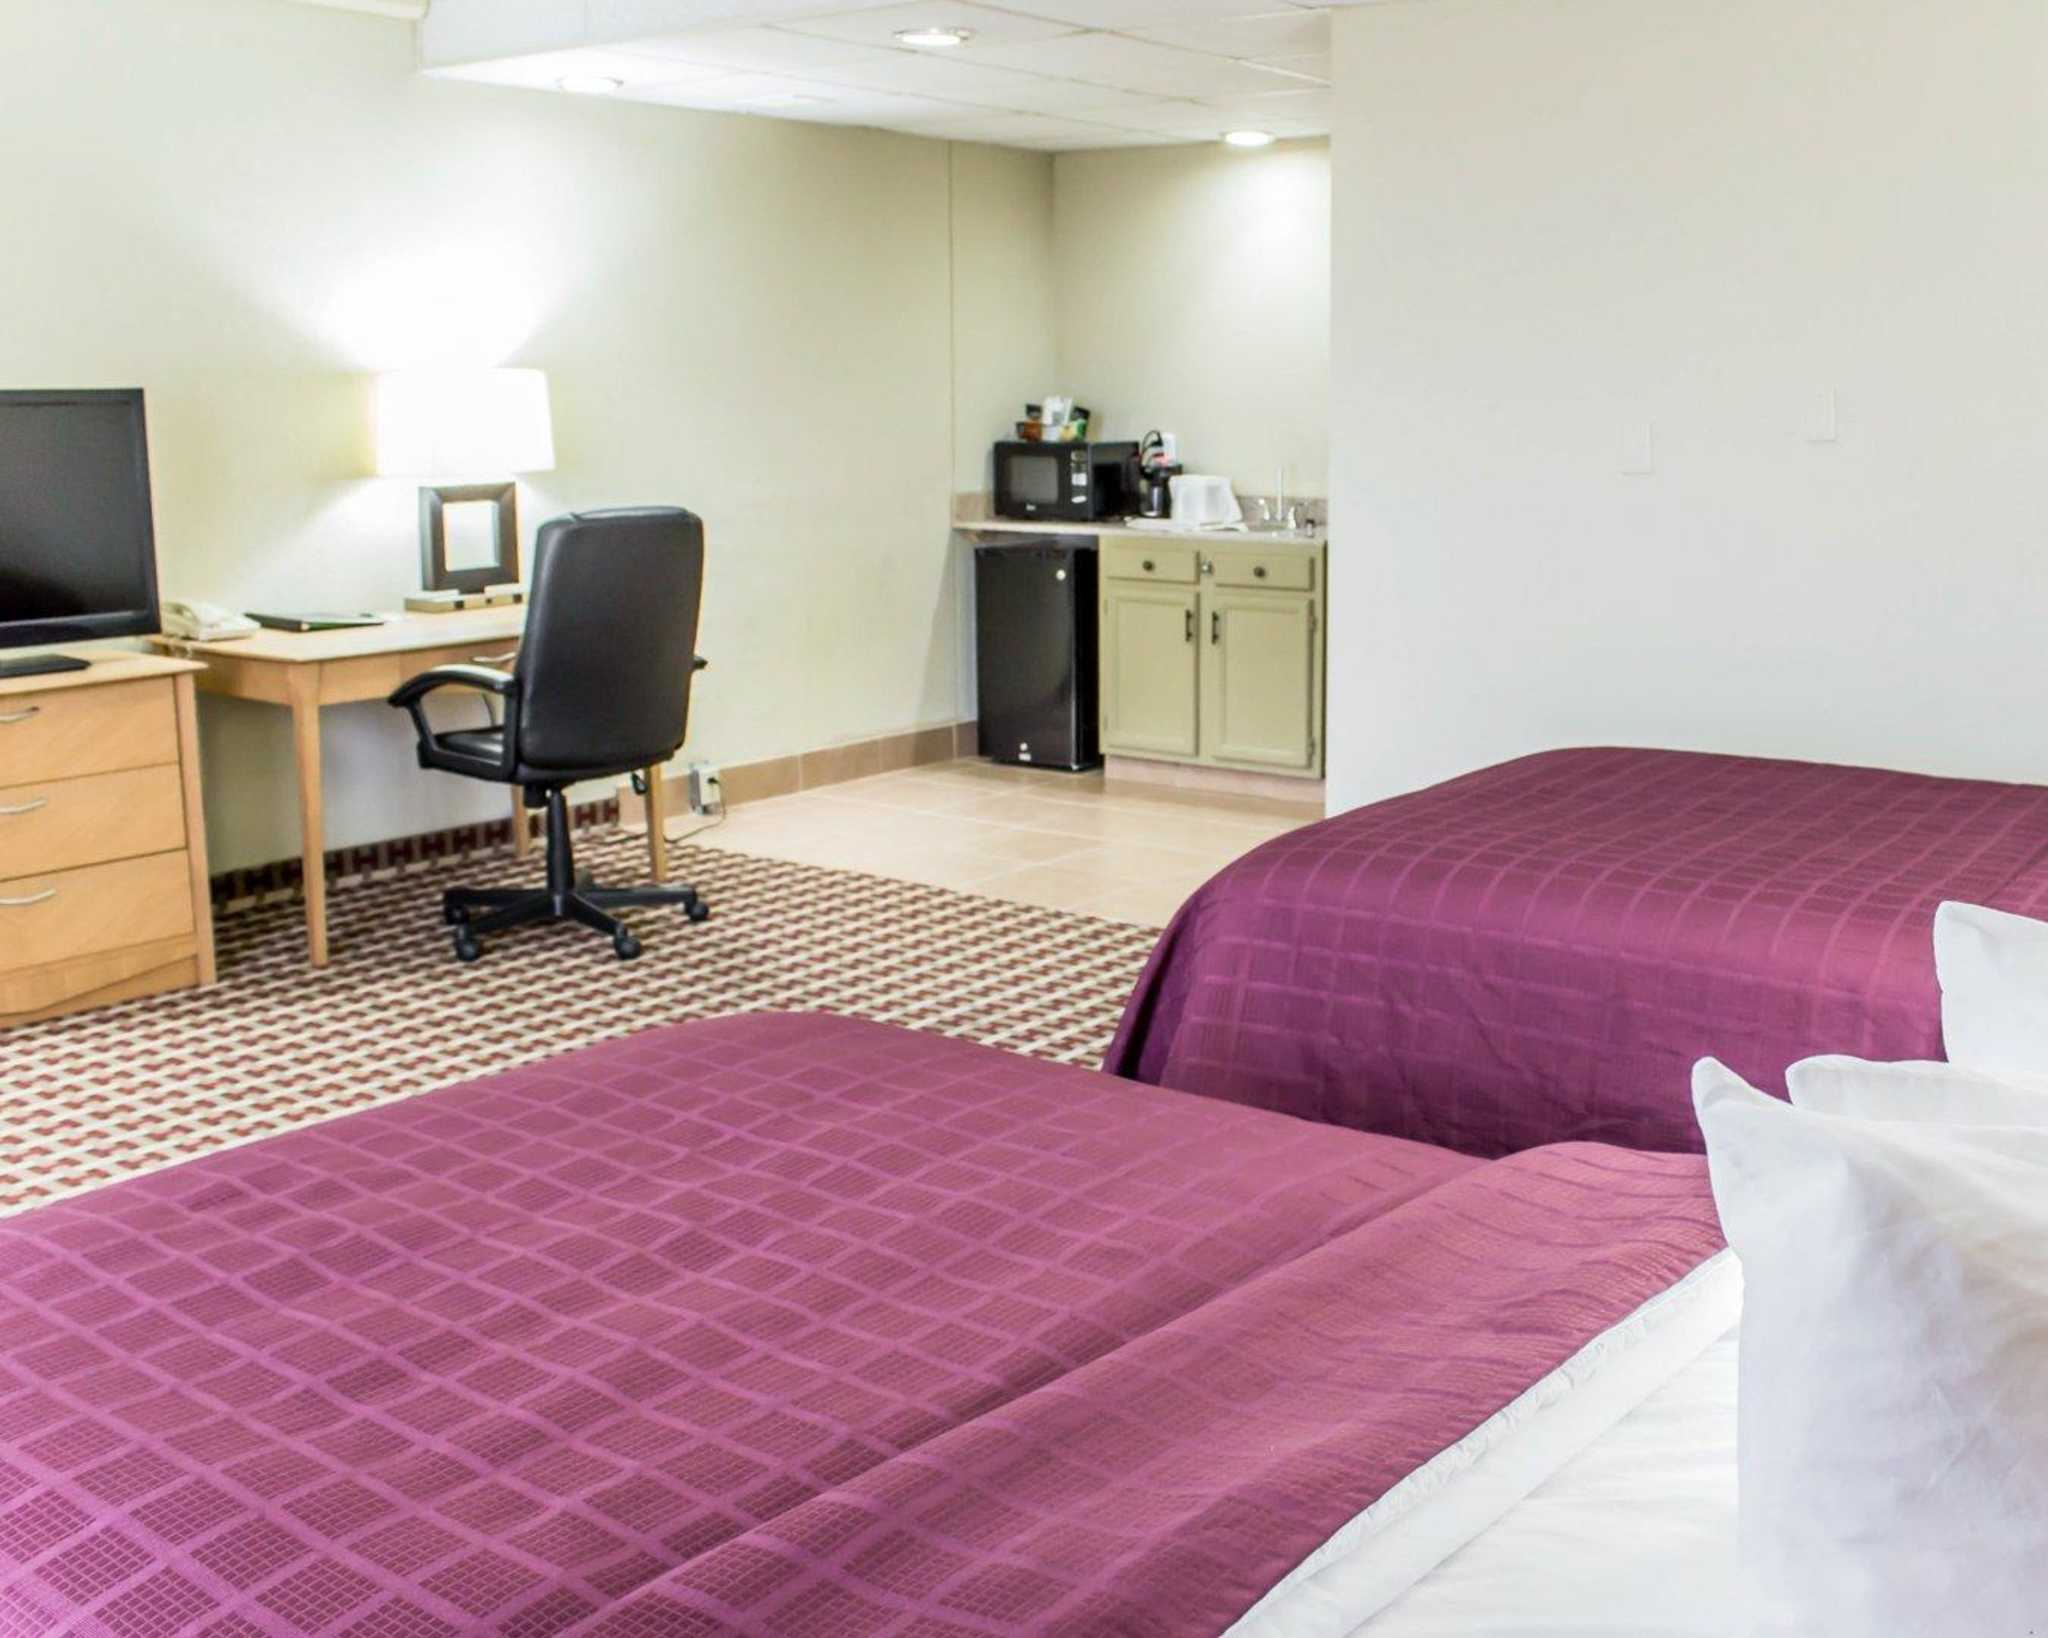 Quality Inn & Suites Fort Bragg image 28